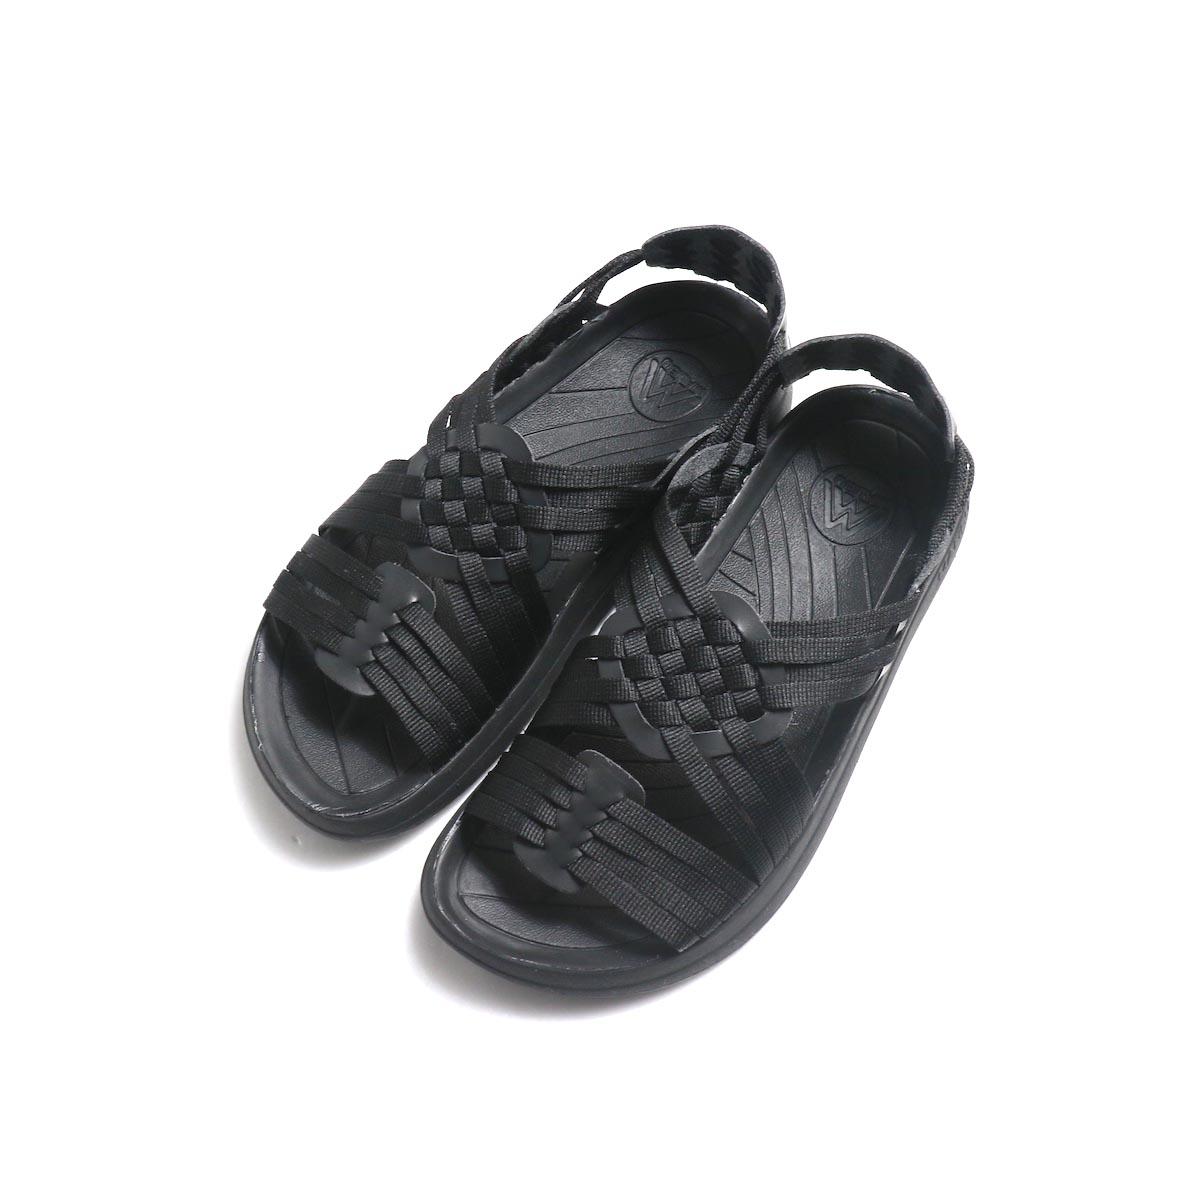 Malibu Sandals / Canyon (Nylon Weave) -Black